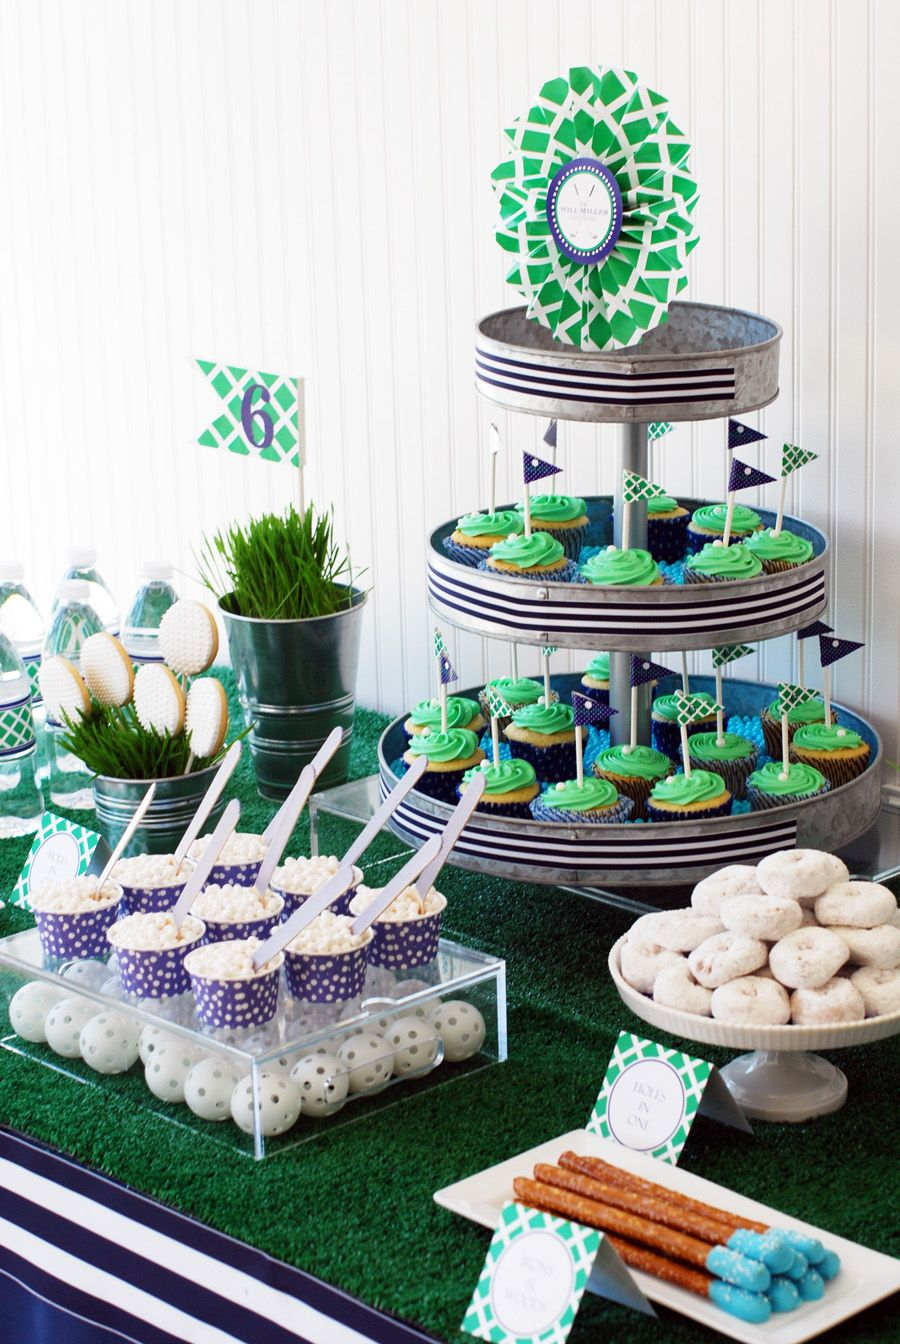 Prime Preppy Golf Birthday Party Dessert Table Whhostess Golf Home Interior And Landscaping Pimpapssignezvosmurscom